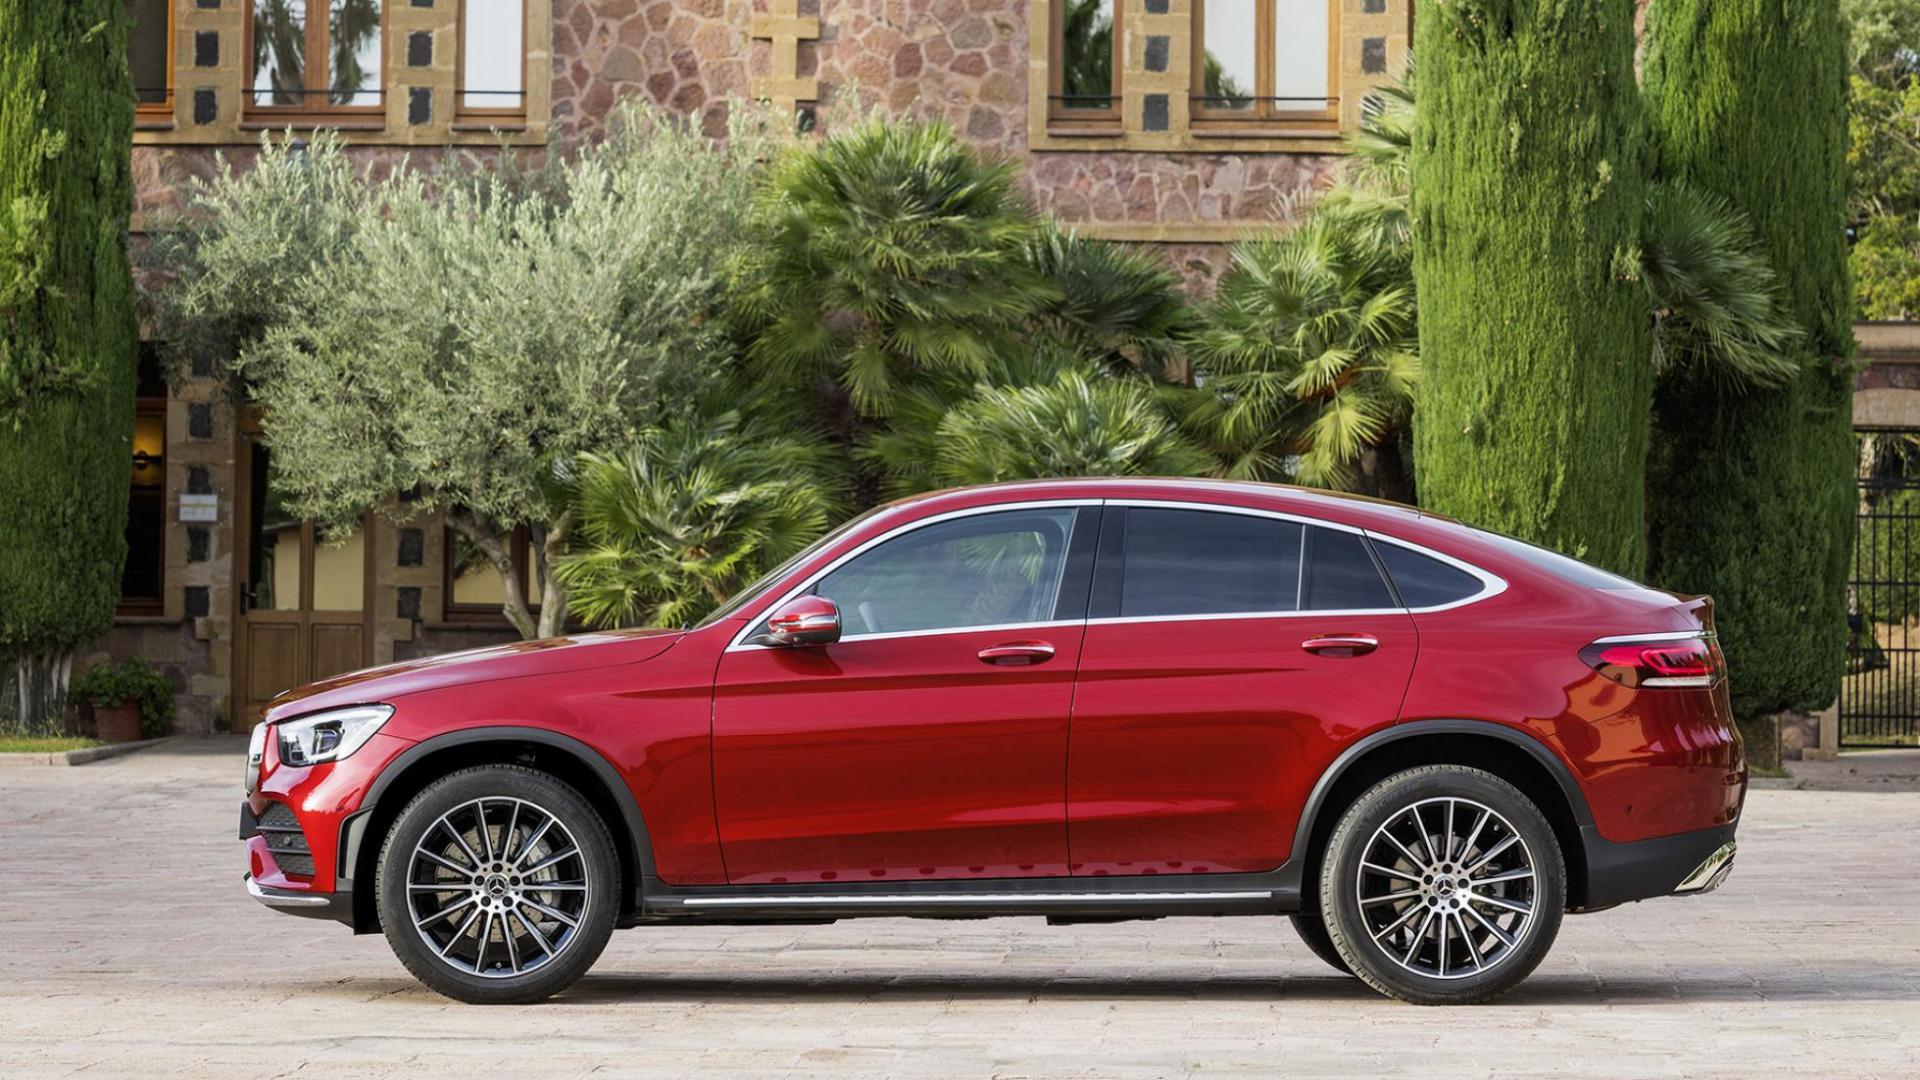 Mercedes GLC Coupé-facelift rood